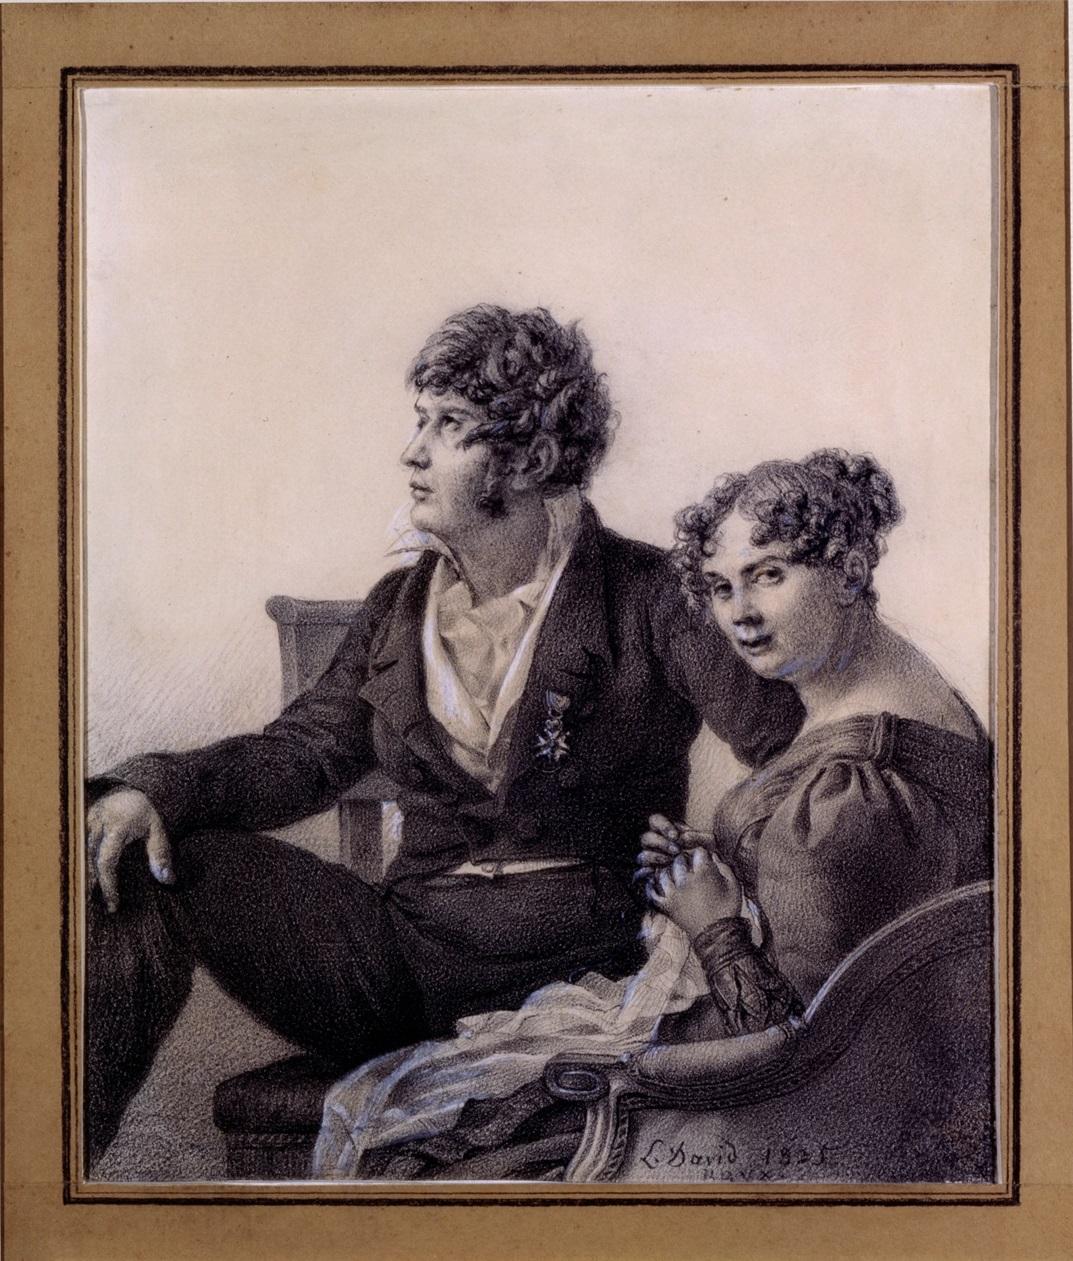 Jacques-Louis David, Ritratto di François-Eugène David e di sua moglie Anne-Thérèse, 24,8 x 20,8 cm. Parigi, collezione Prat